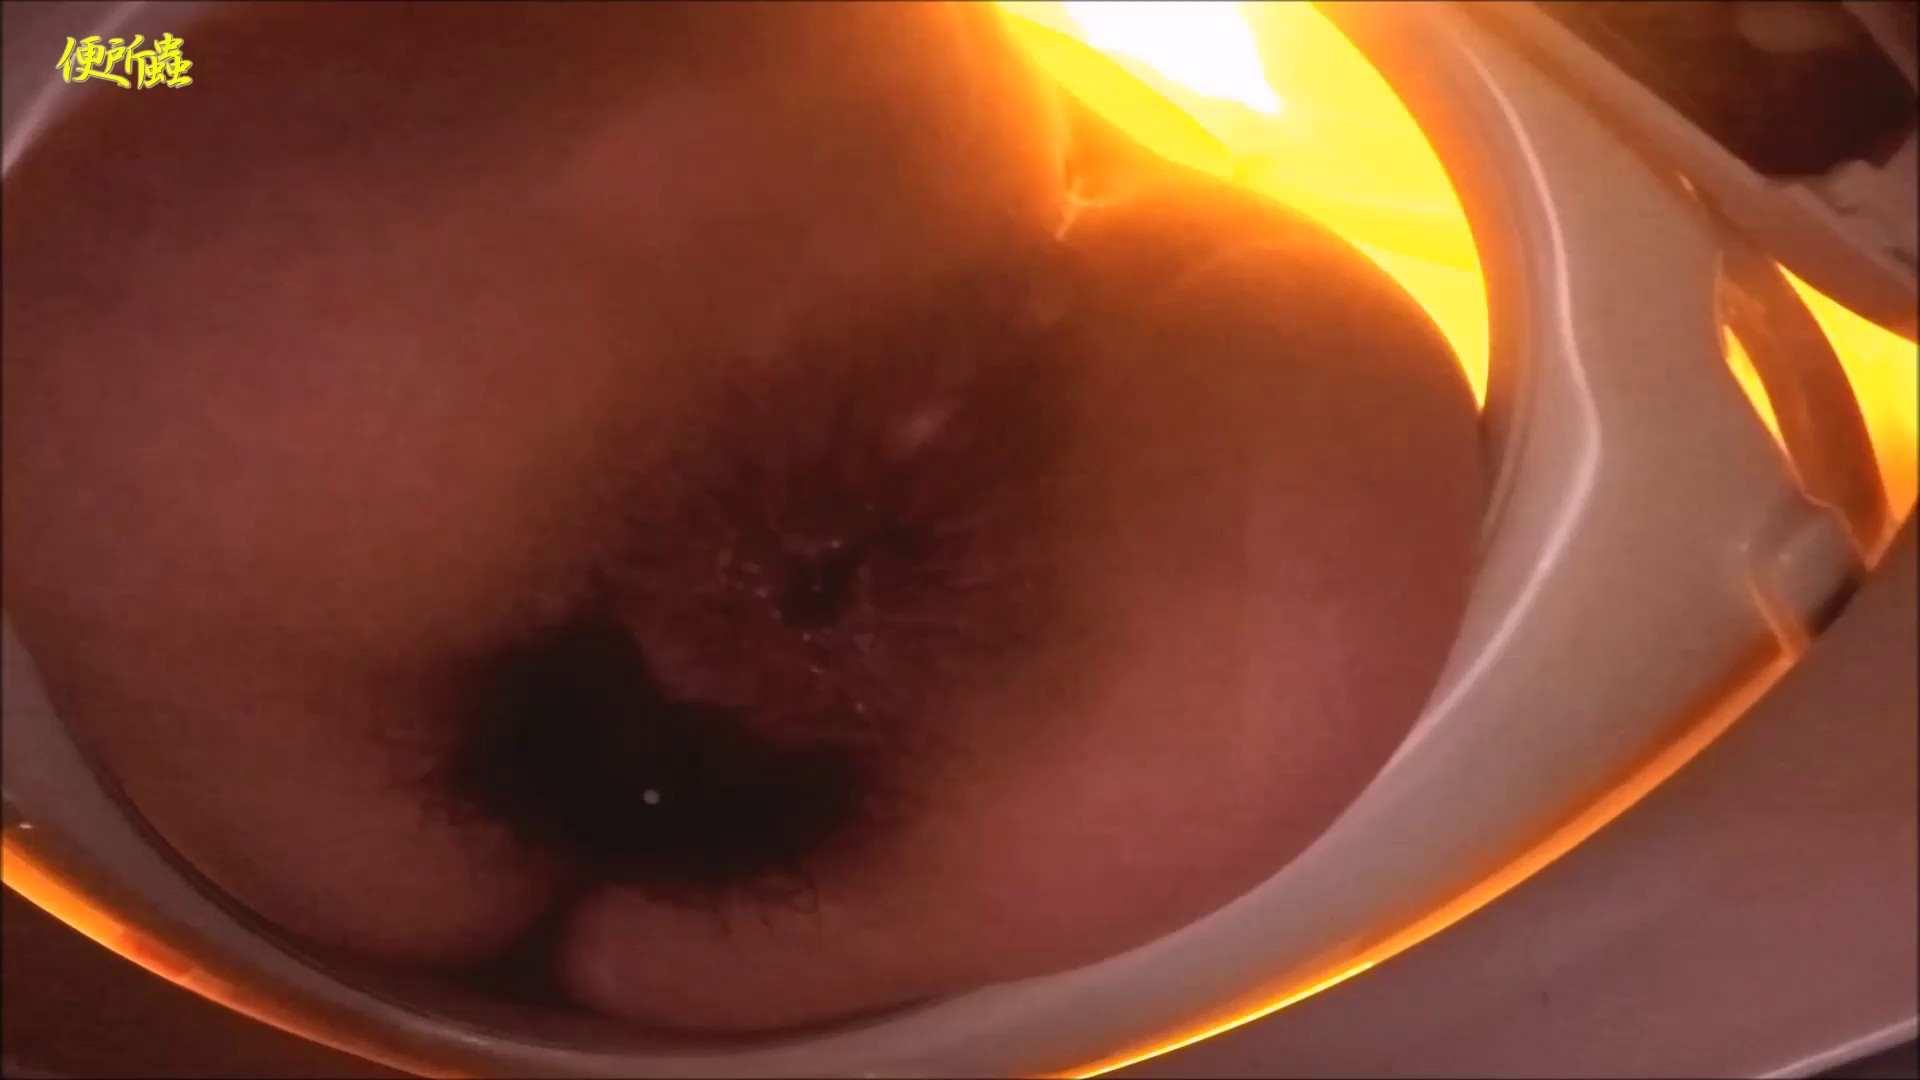 vol.08 便所蟲さんのリターン~寺子屋洗面所盗撮~ 盛合せ ヌード画像 94画像 11